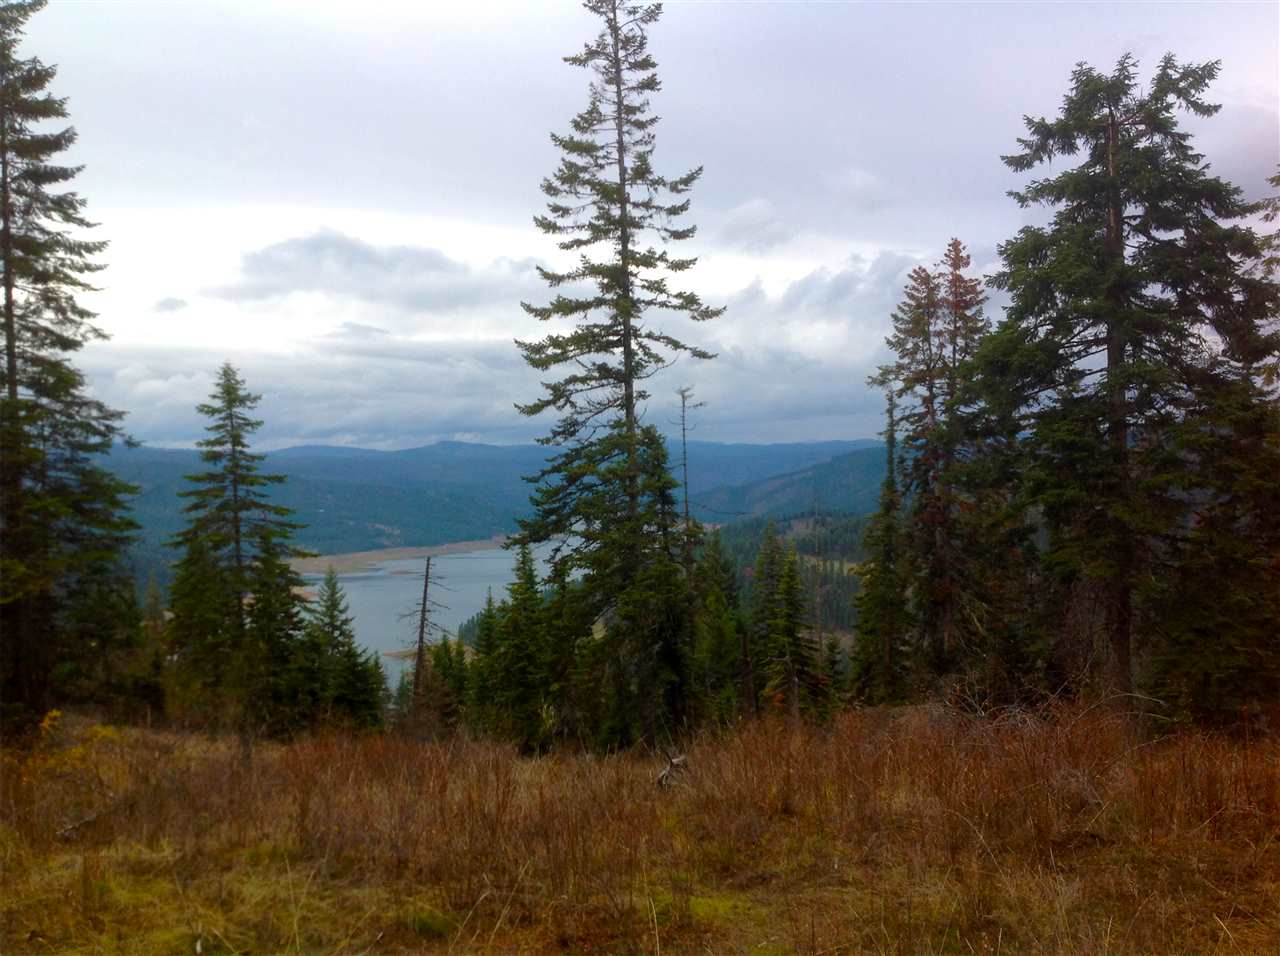 Land for Sale at Parcel 14 Tie Creek Orofino, Idaho 83544